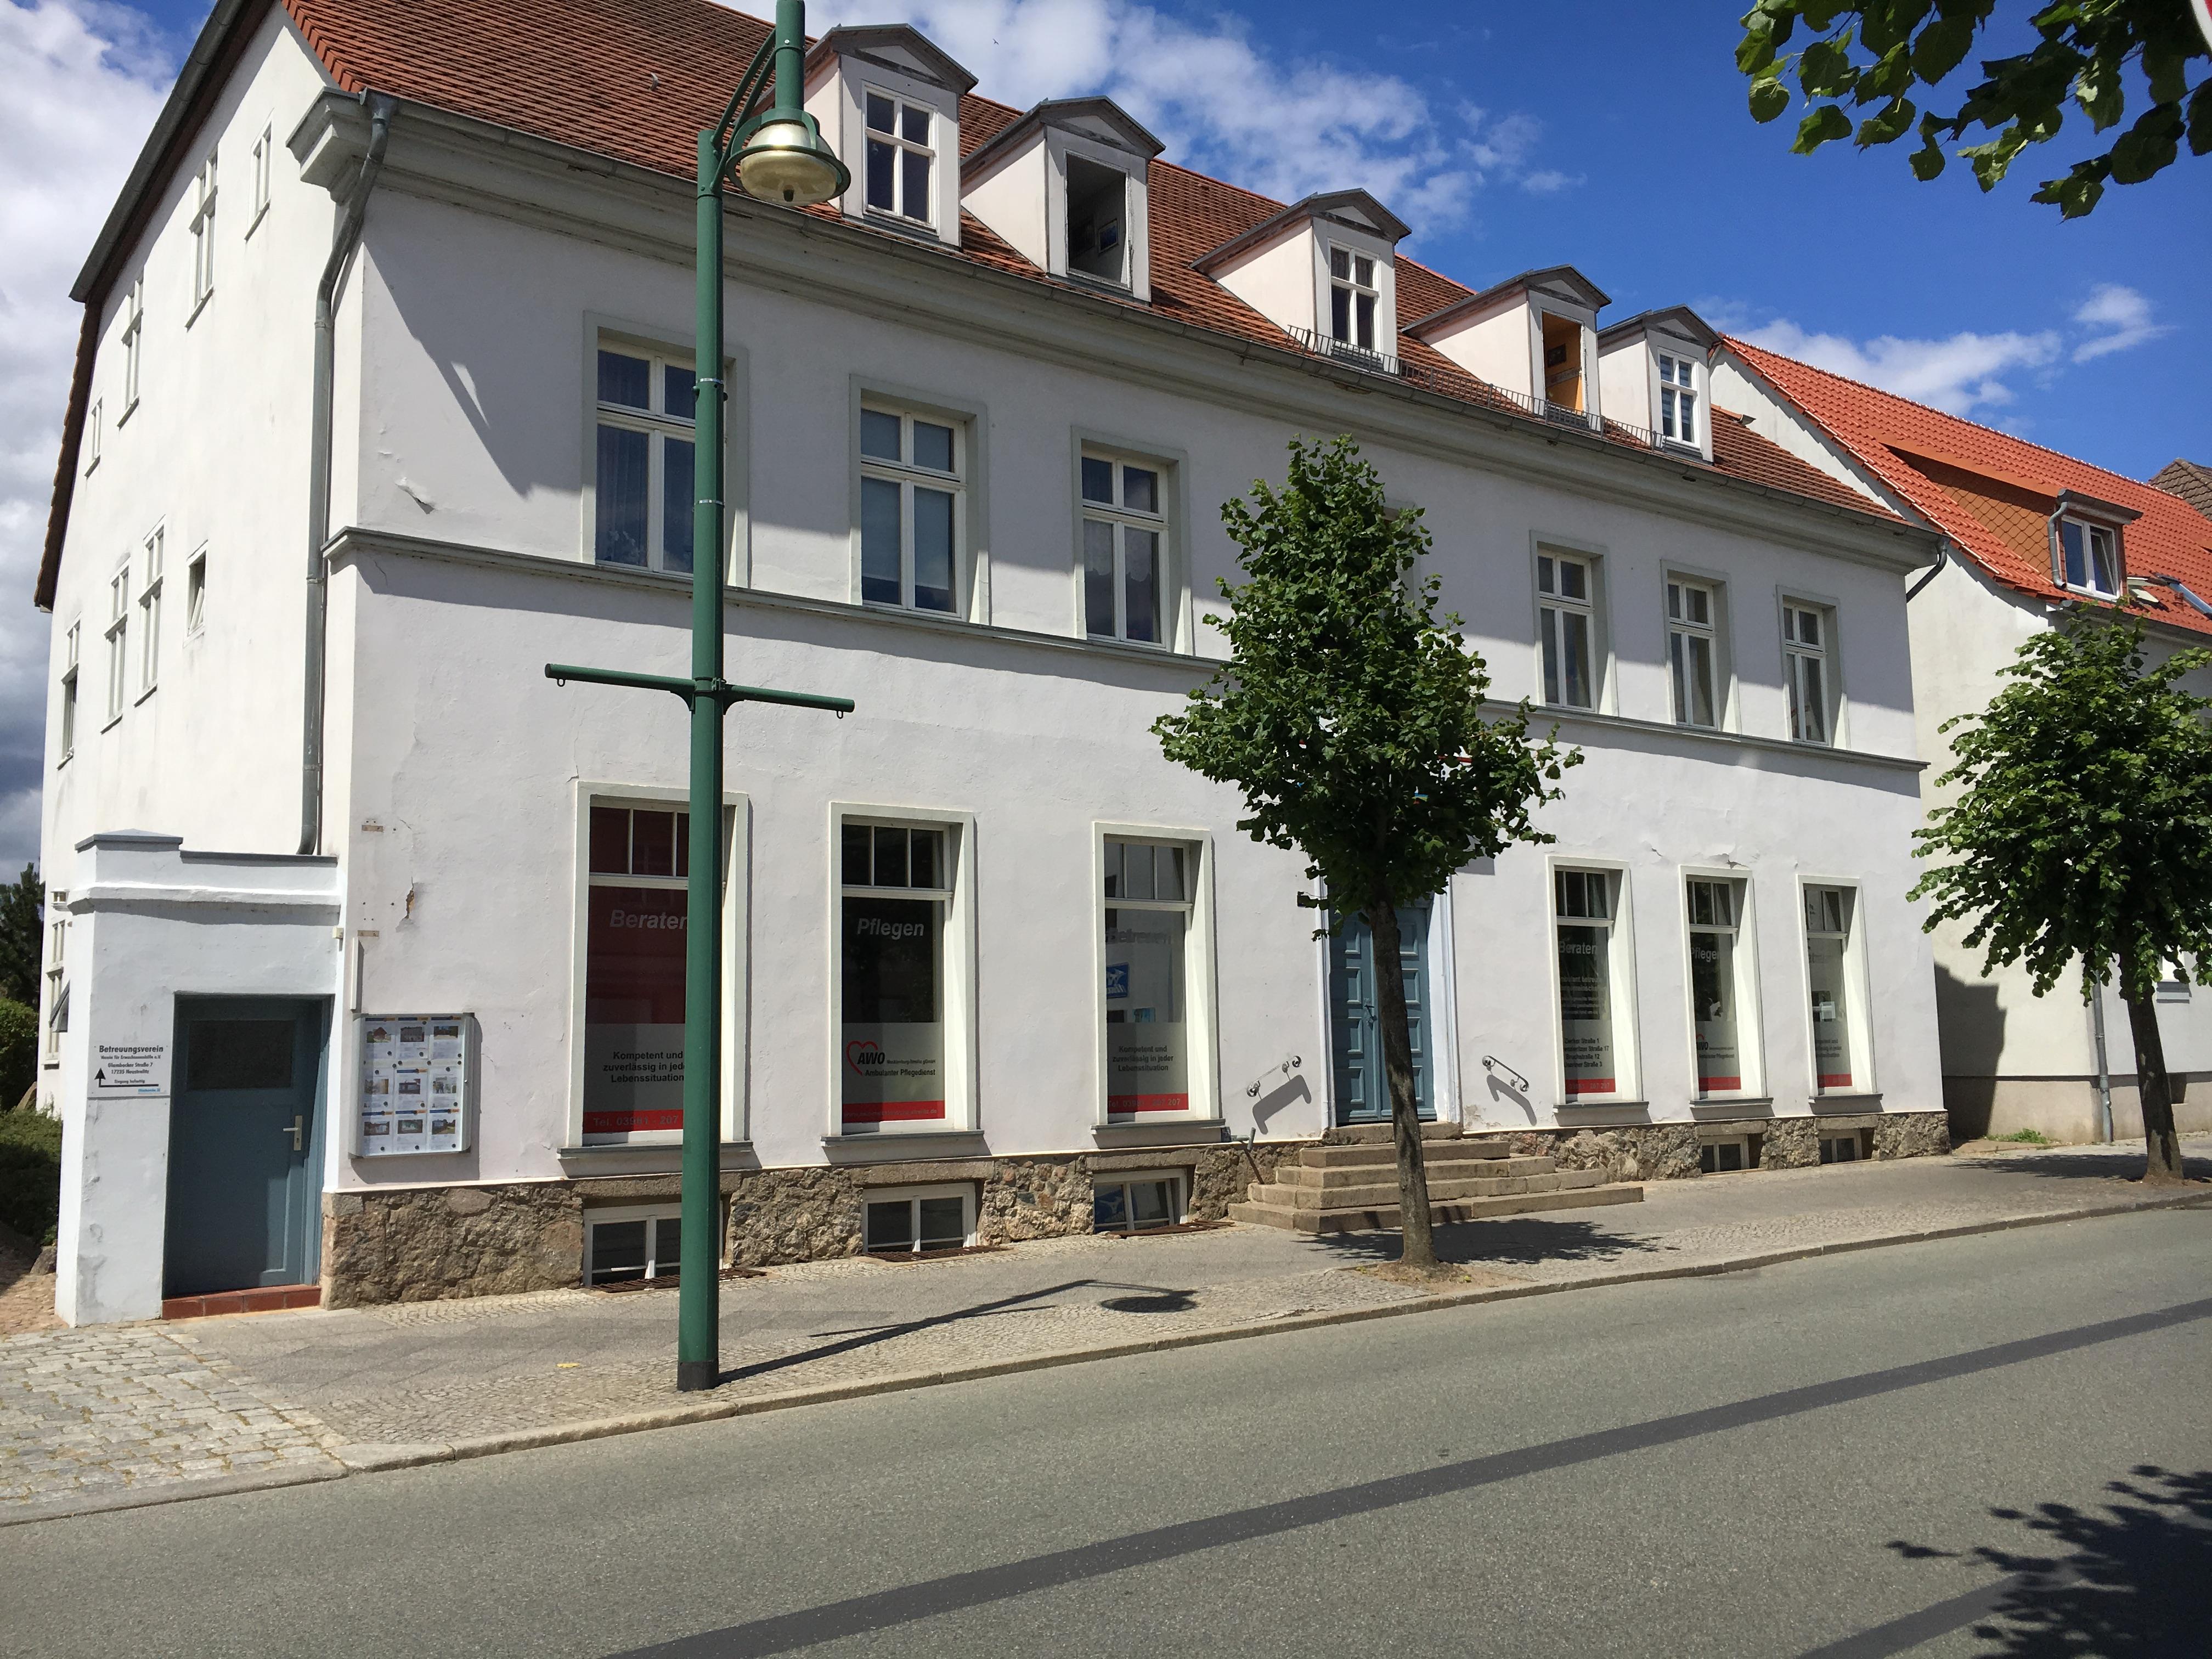 Glambecker Straße 7